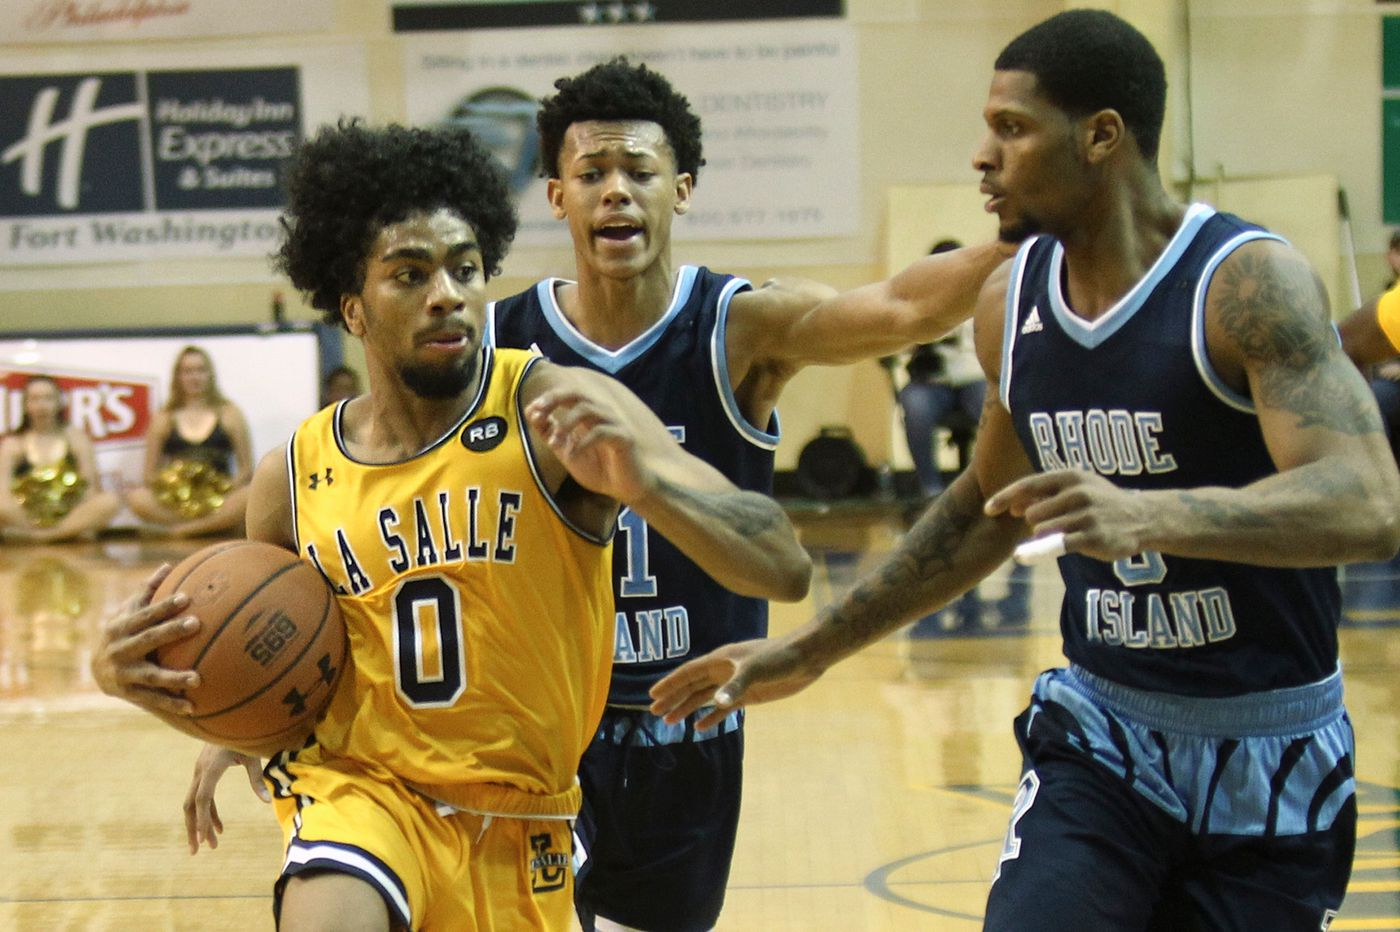 La Salle holds off Fordham